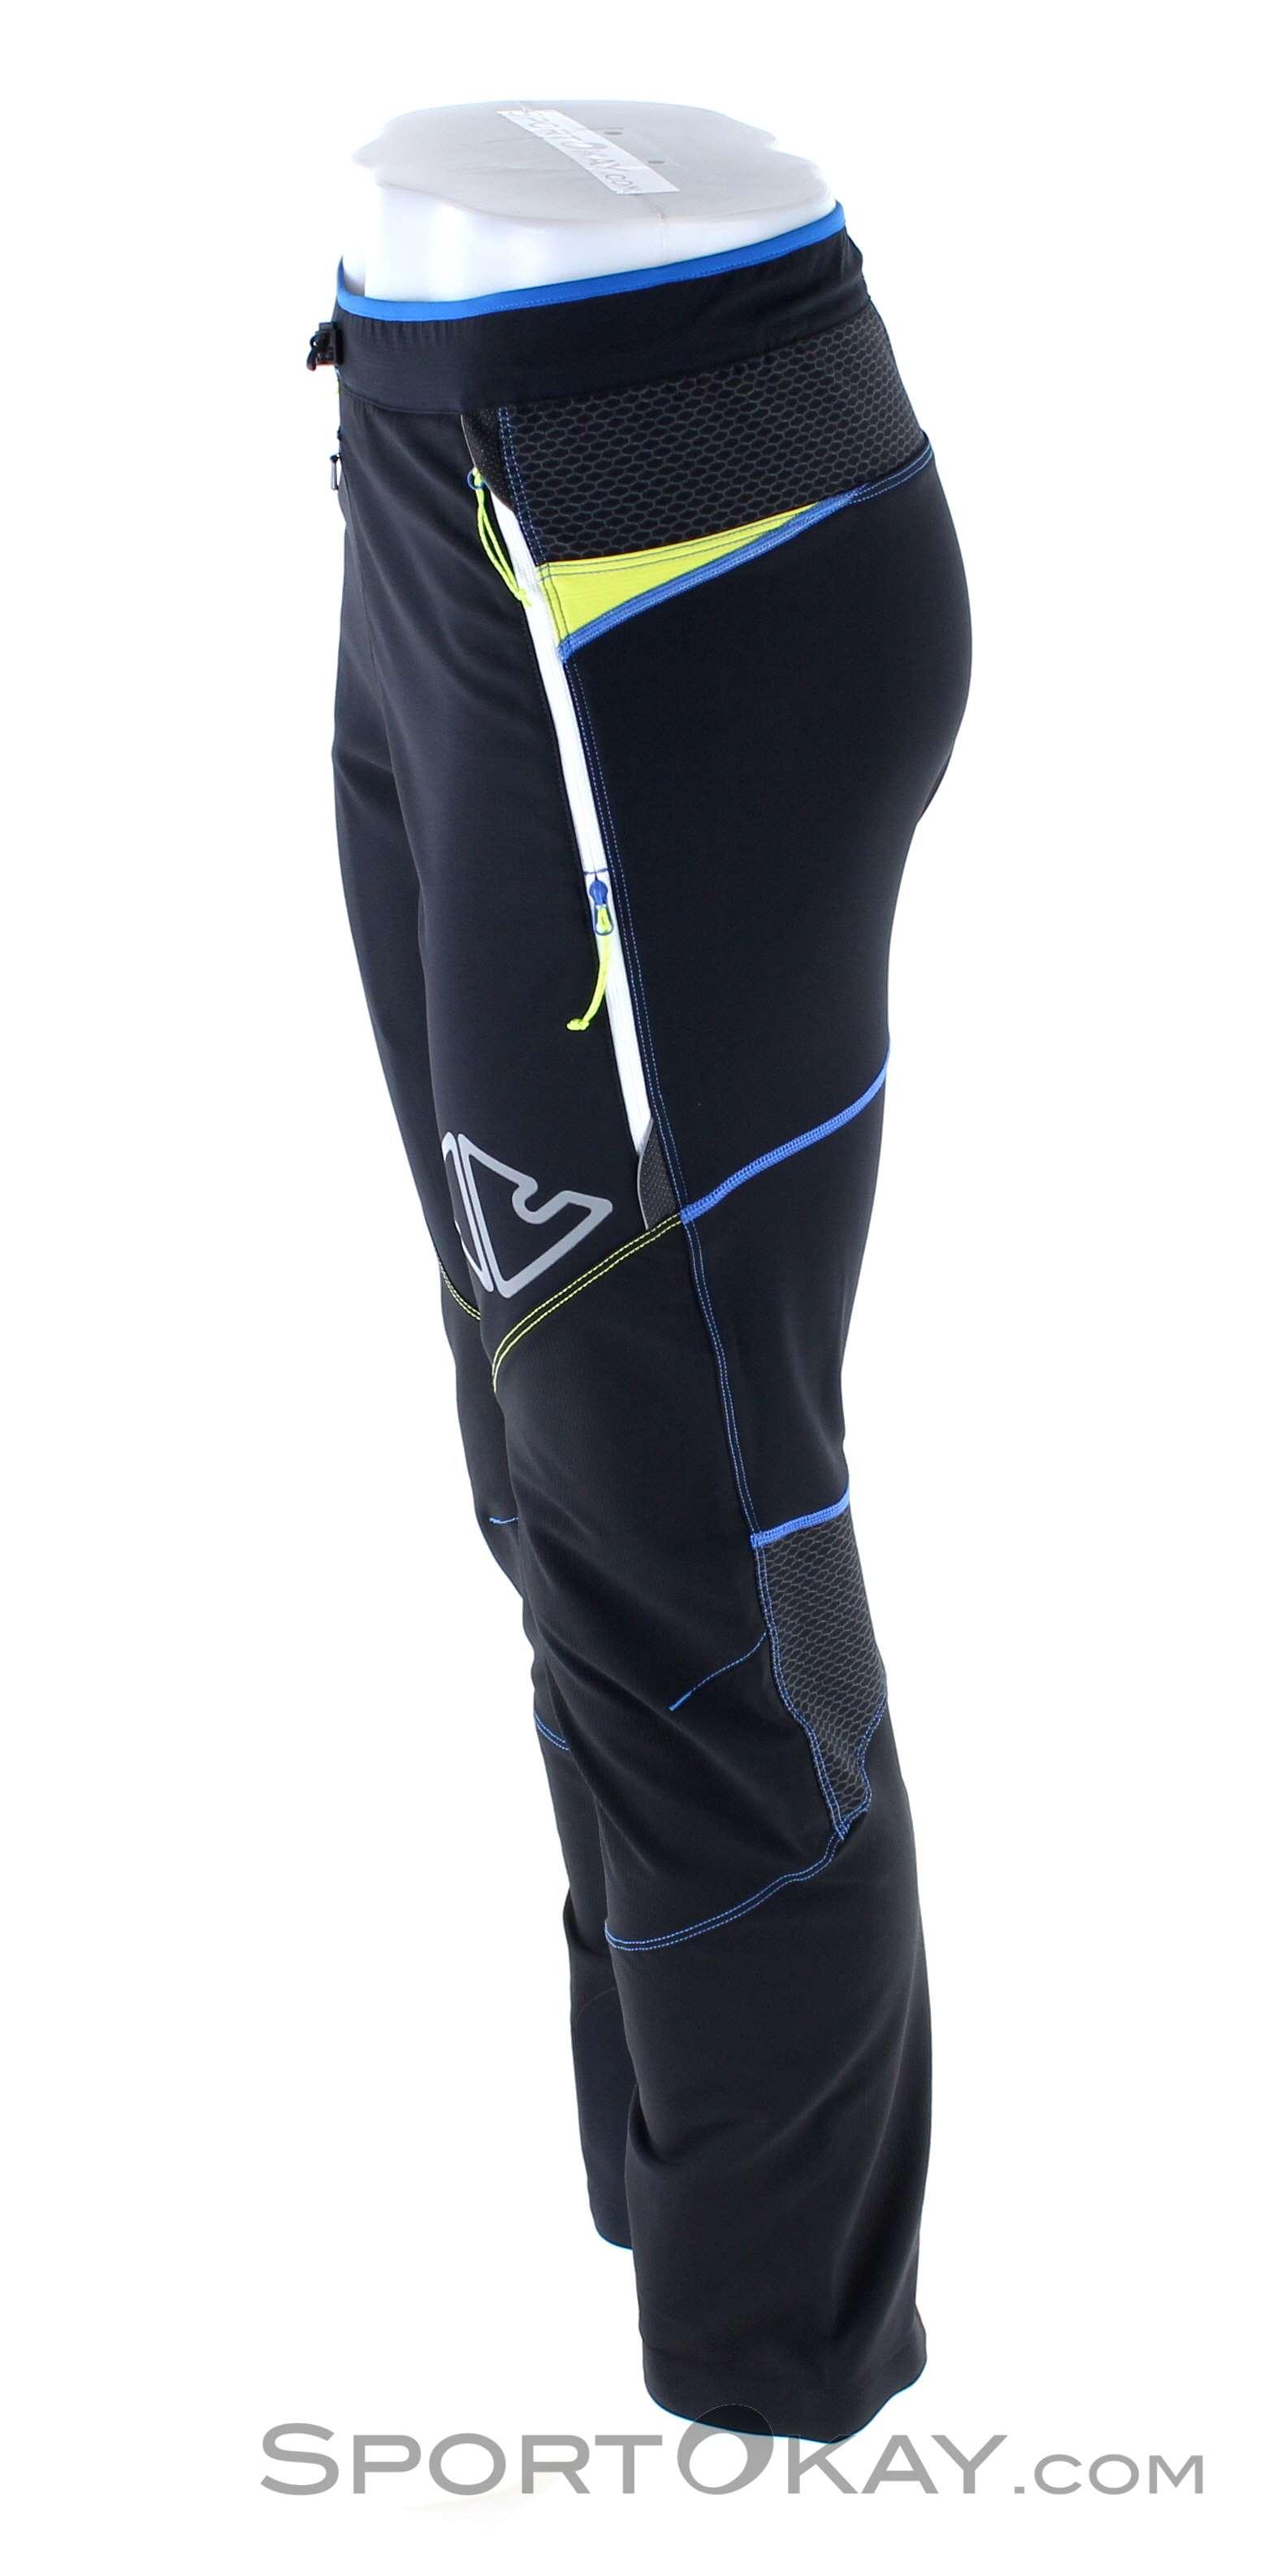 Crazy Idea Crazy Idea Zenith Mens Ski Touring Pants